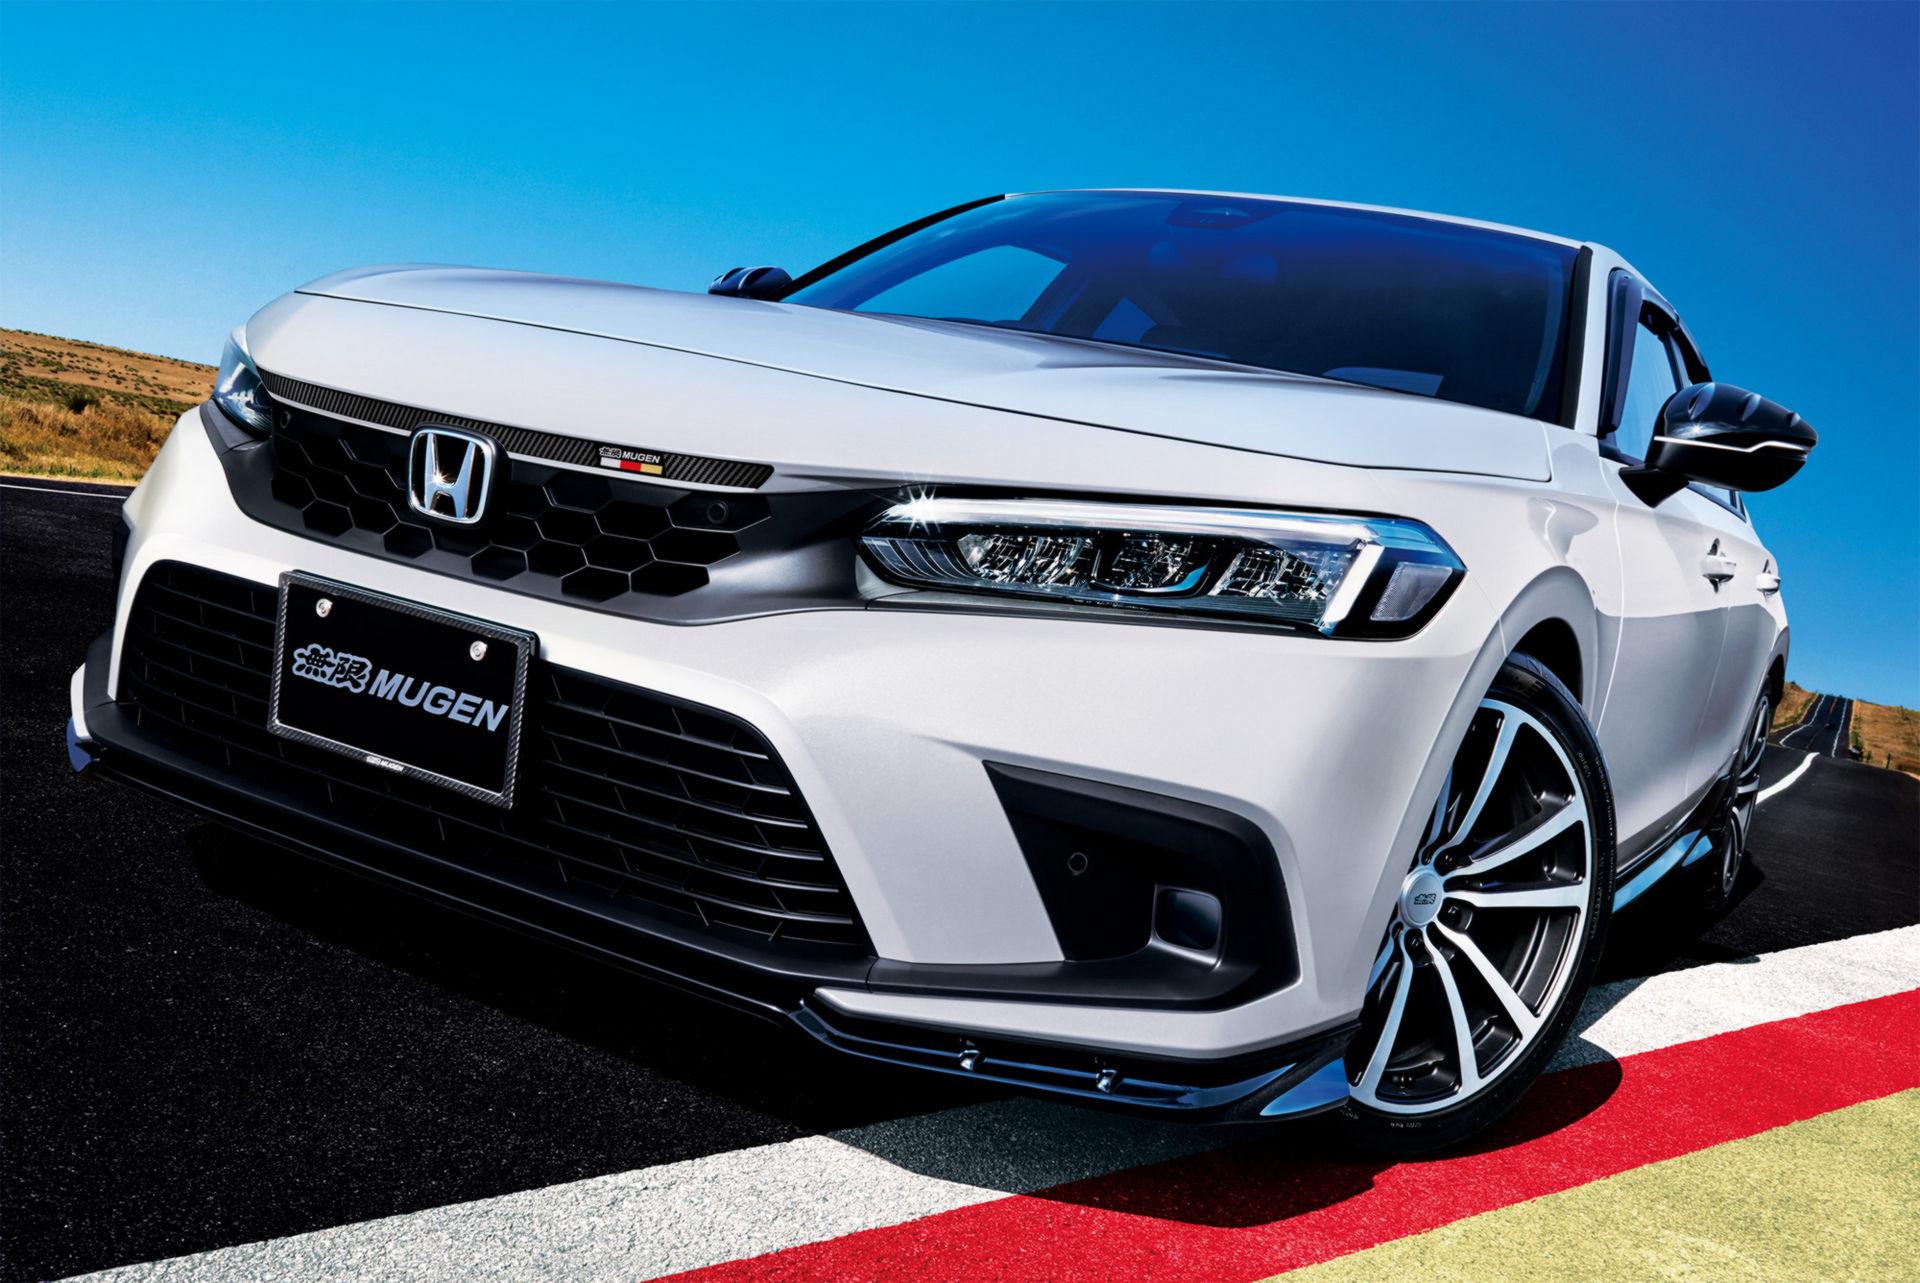 Honda-Civic-2021-Mugen-11